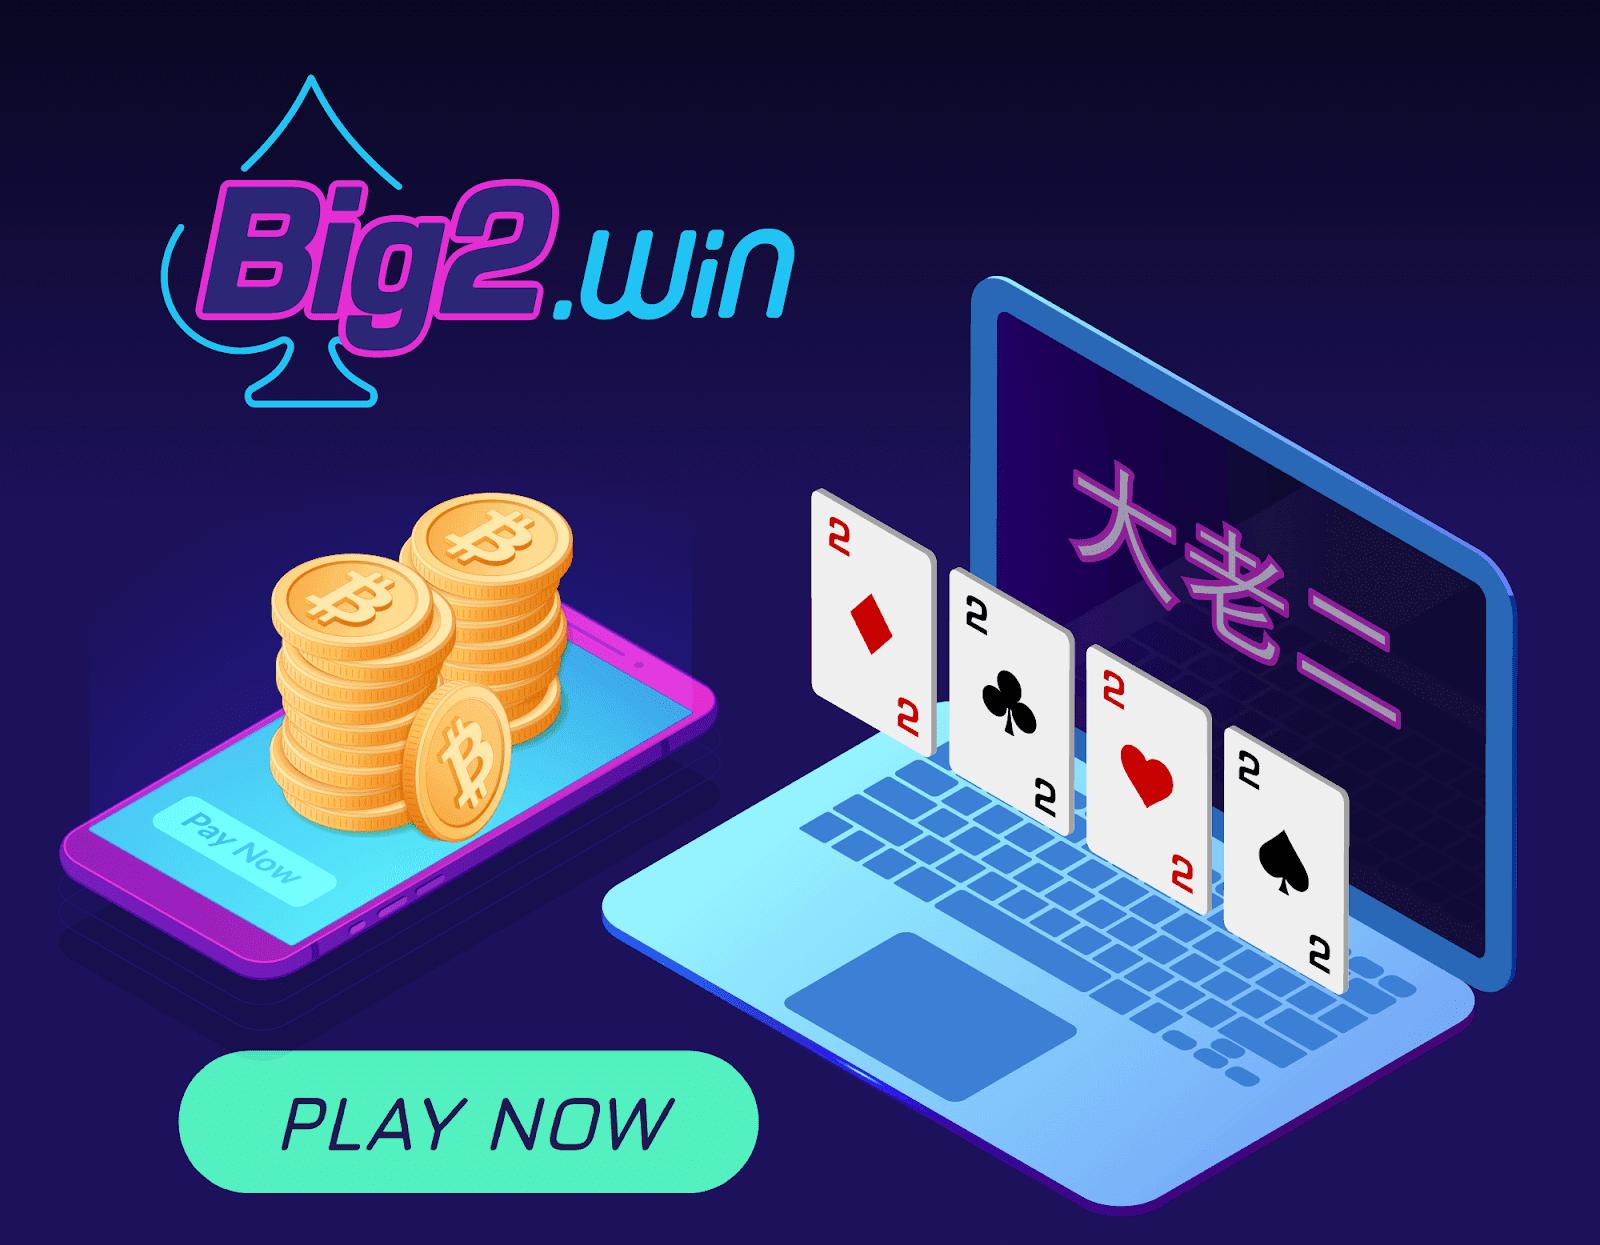 Win Big with the Crypto Card Game Big 2 大老二